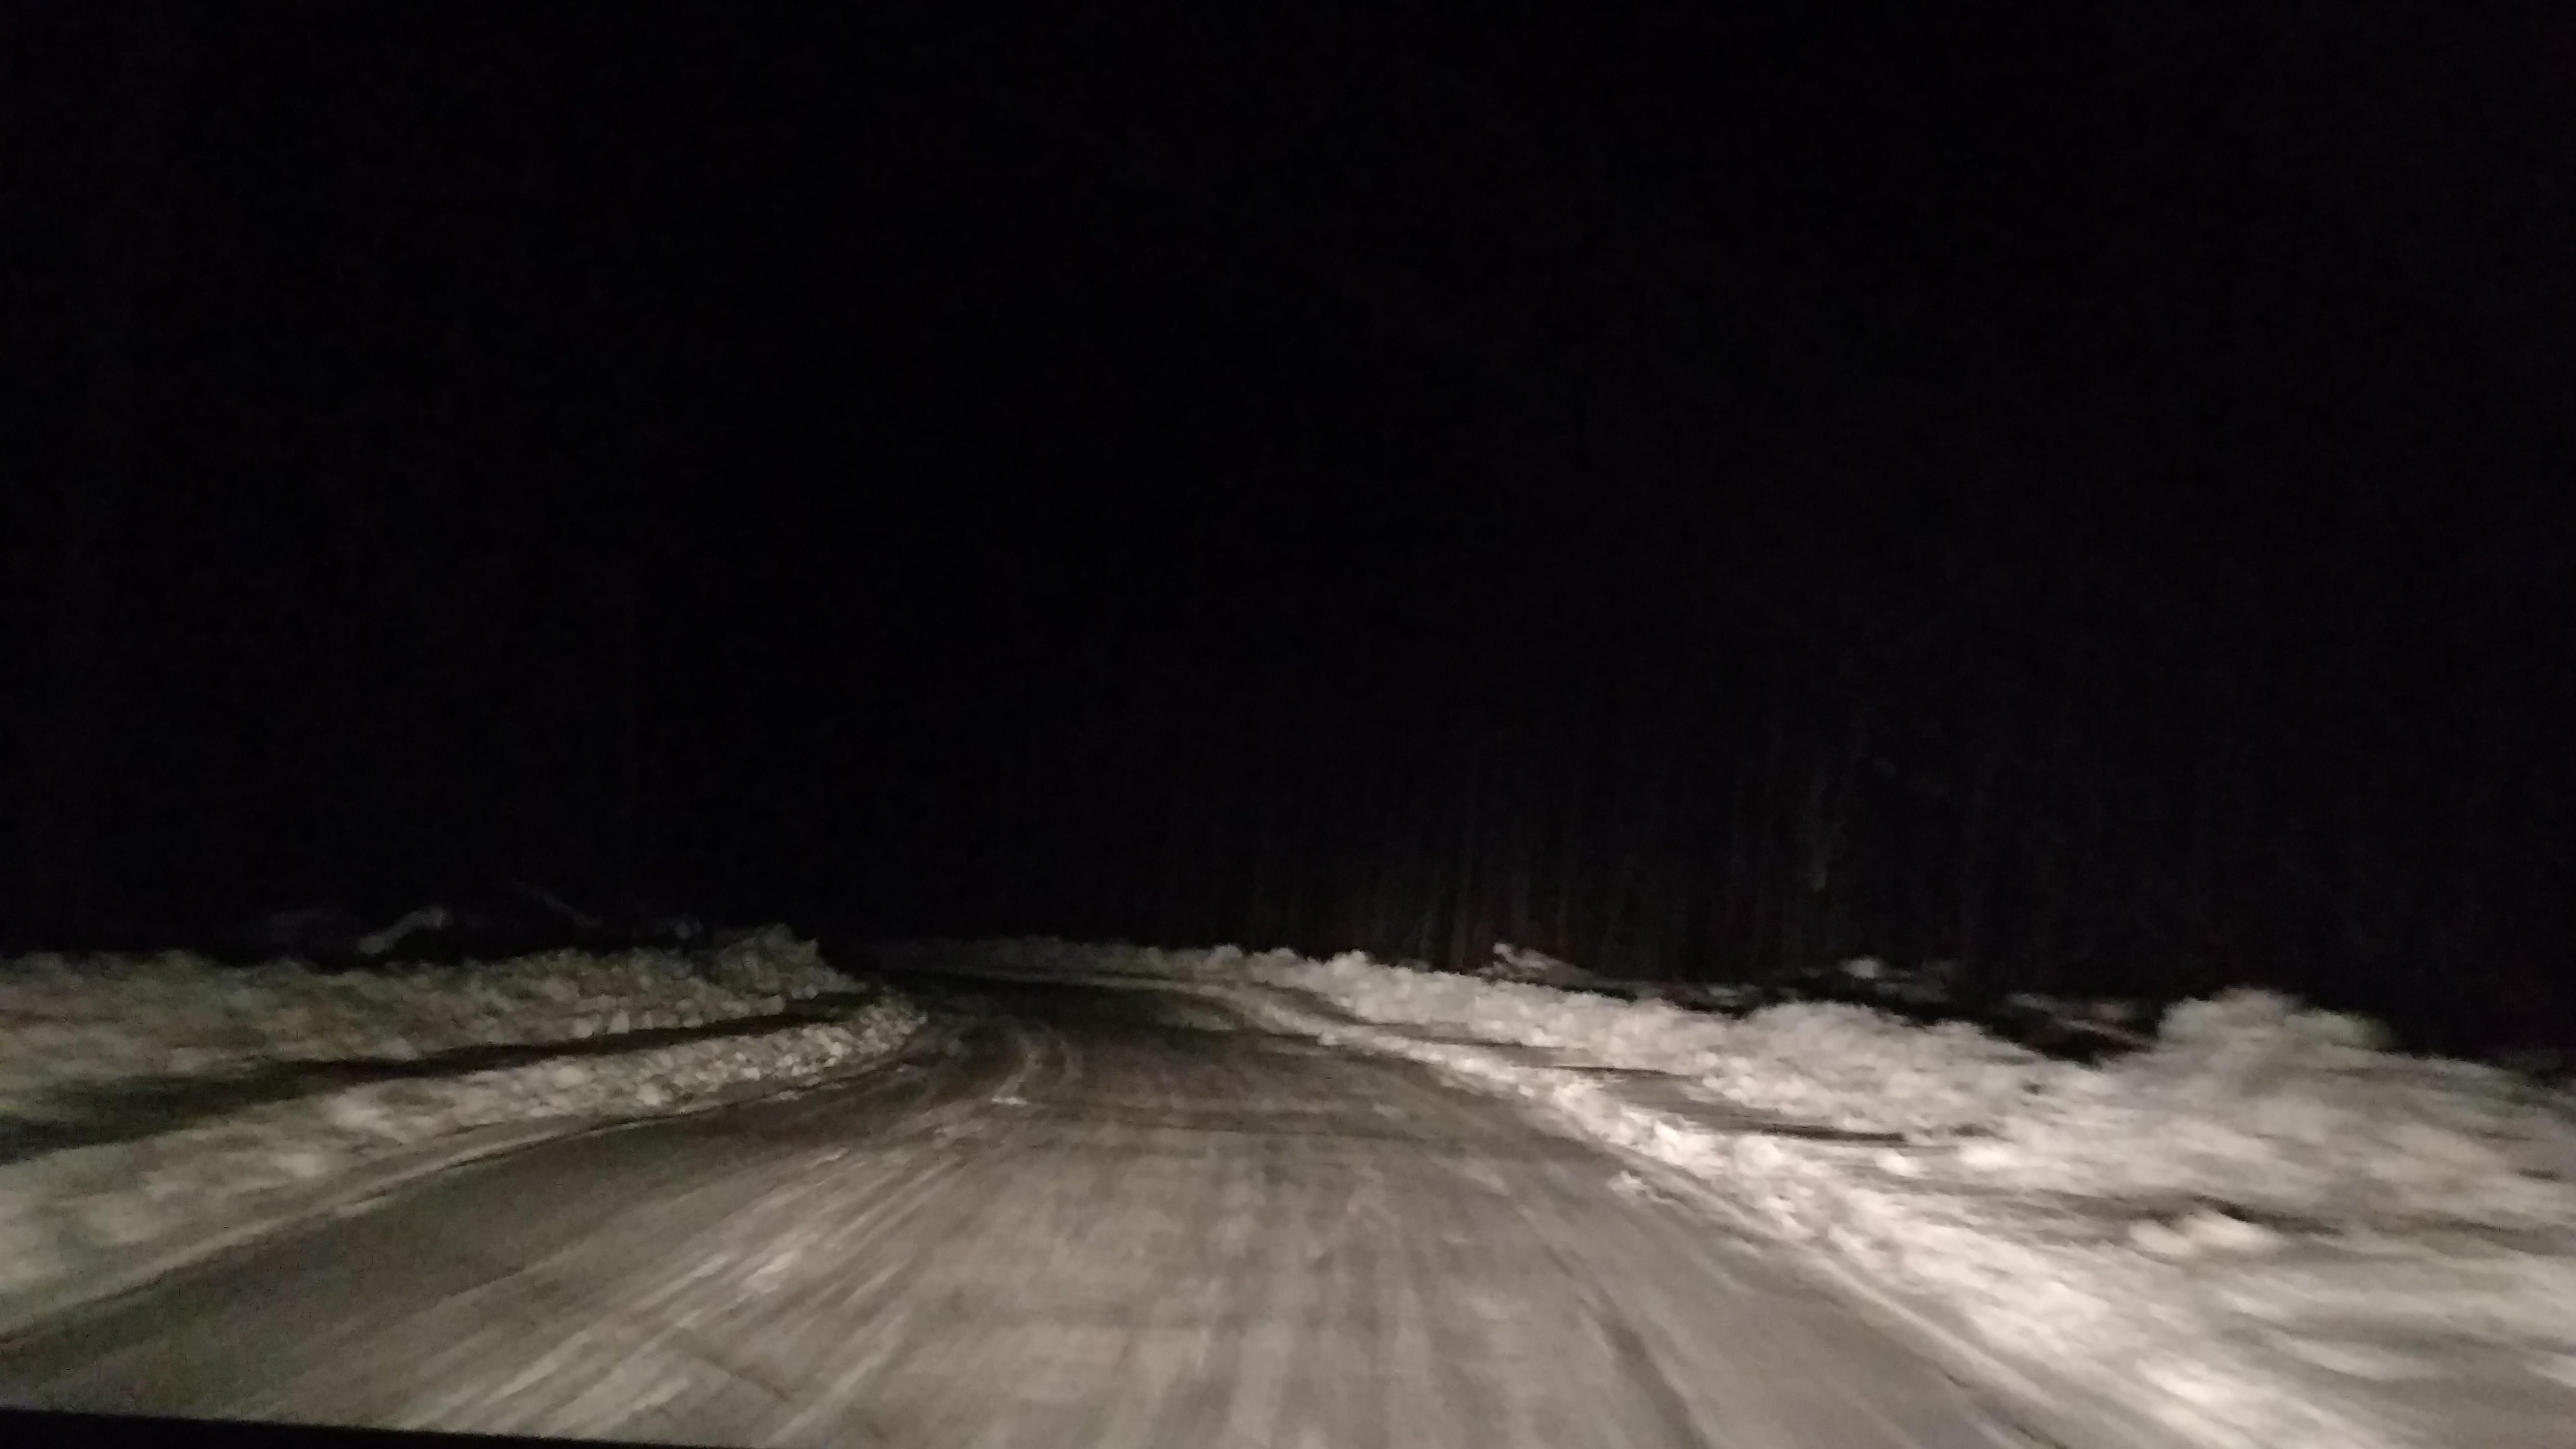 1-winter road at night 3-16